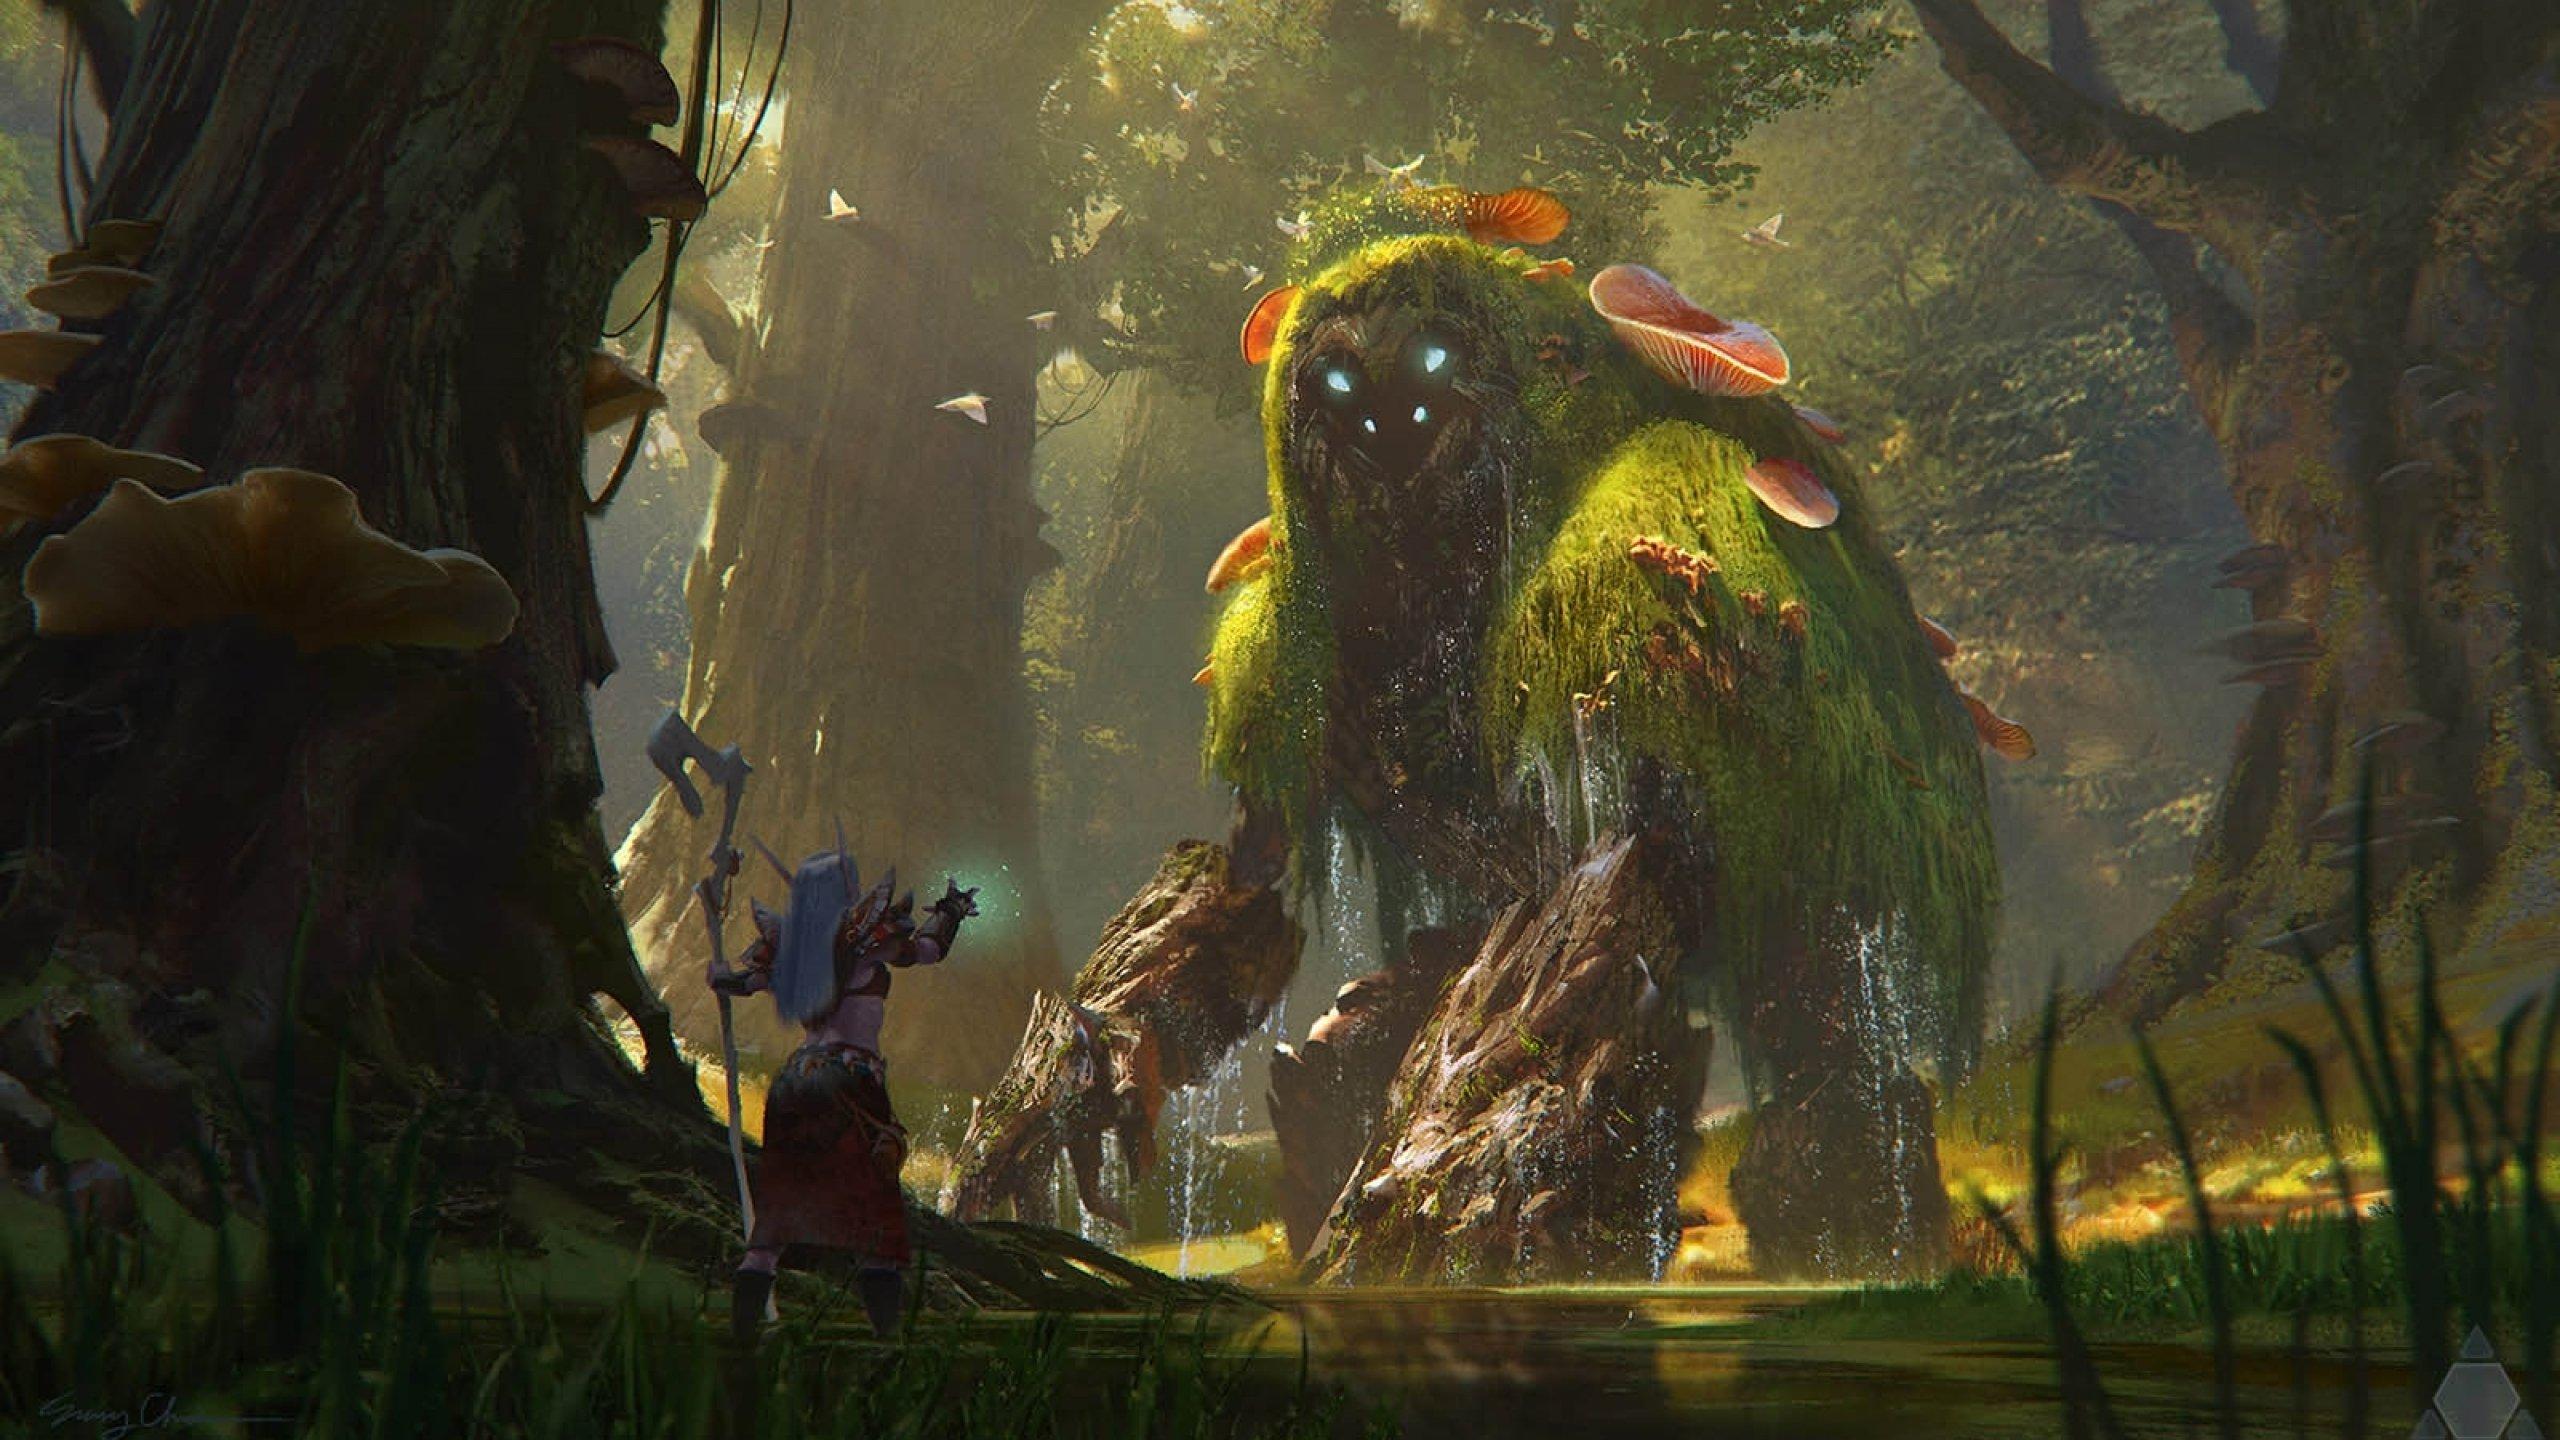 Fantasy creature art artwork monster wallpaper | 2560x1440 ... - photo#34